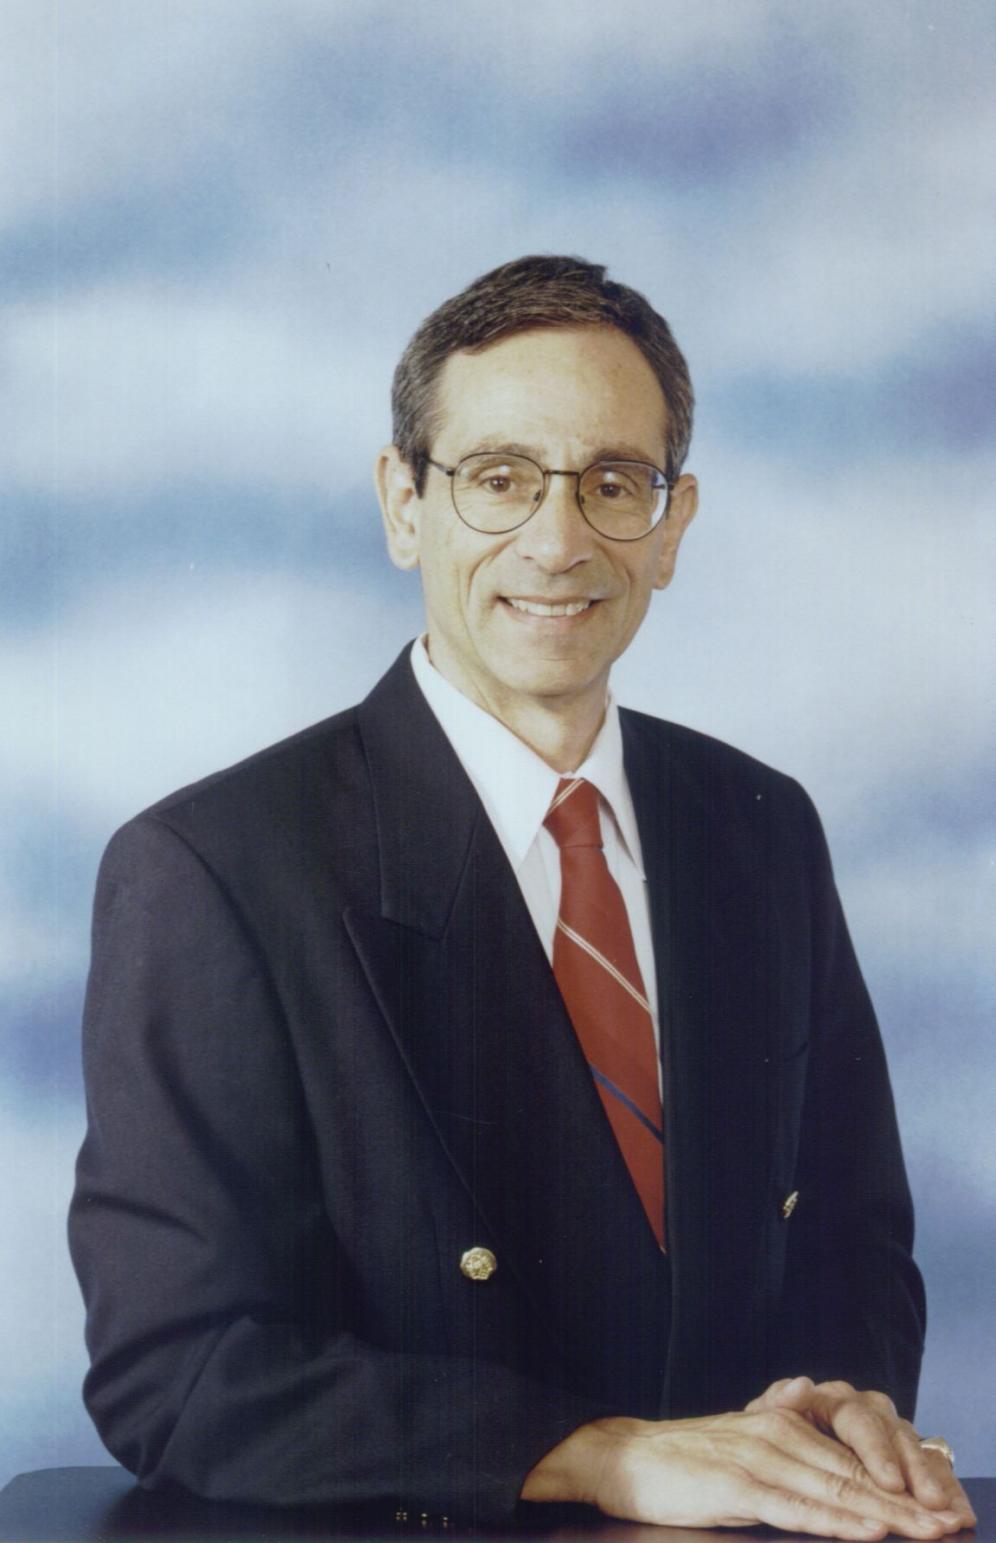 Robert Barrows, President of R.M. Barrows, Inc. Advertising & Public Relations